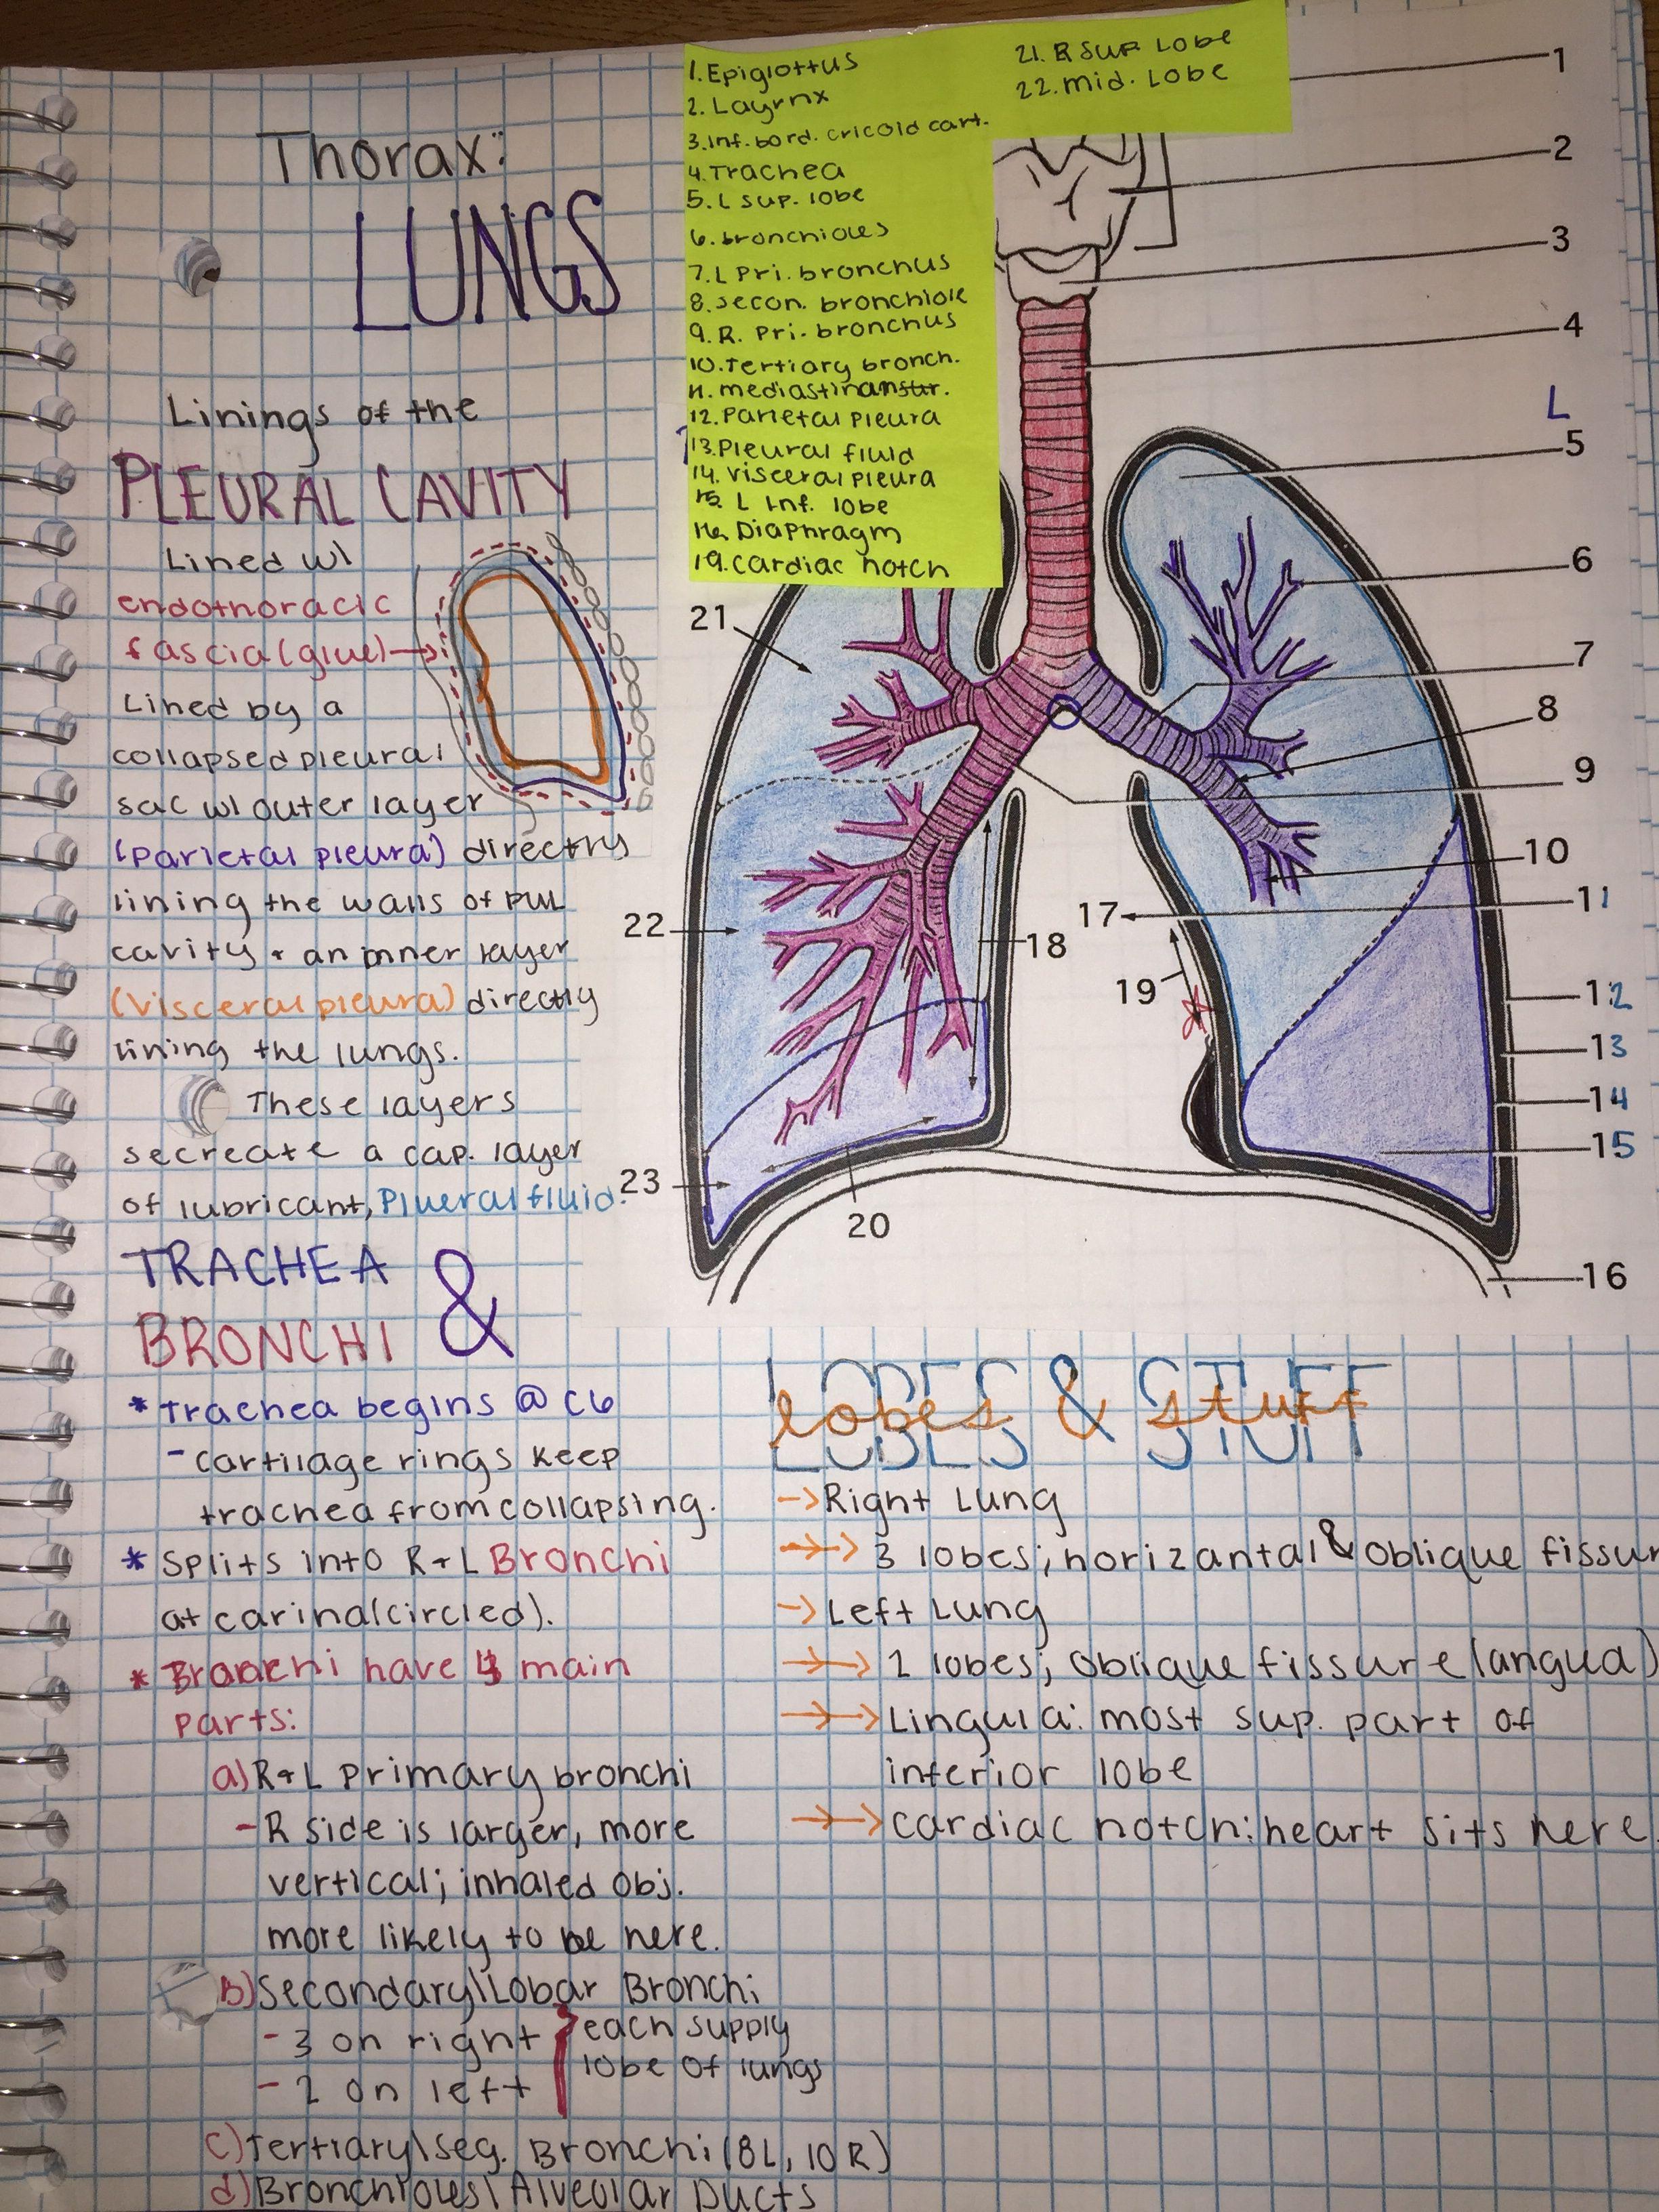 Anatomy Thorax Notes | So Collegiate | Human anatomy